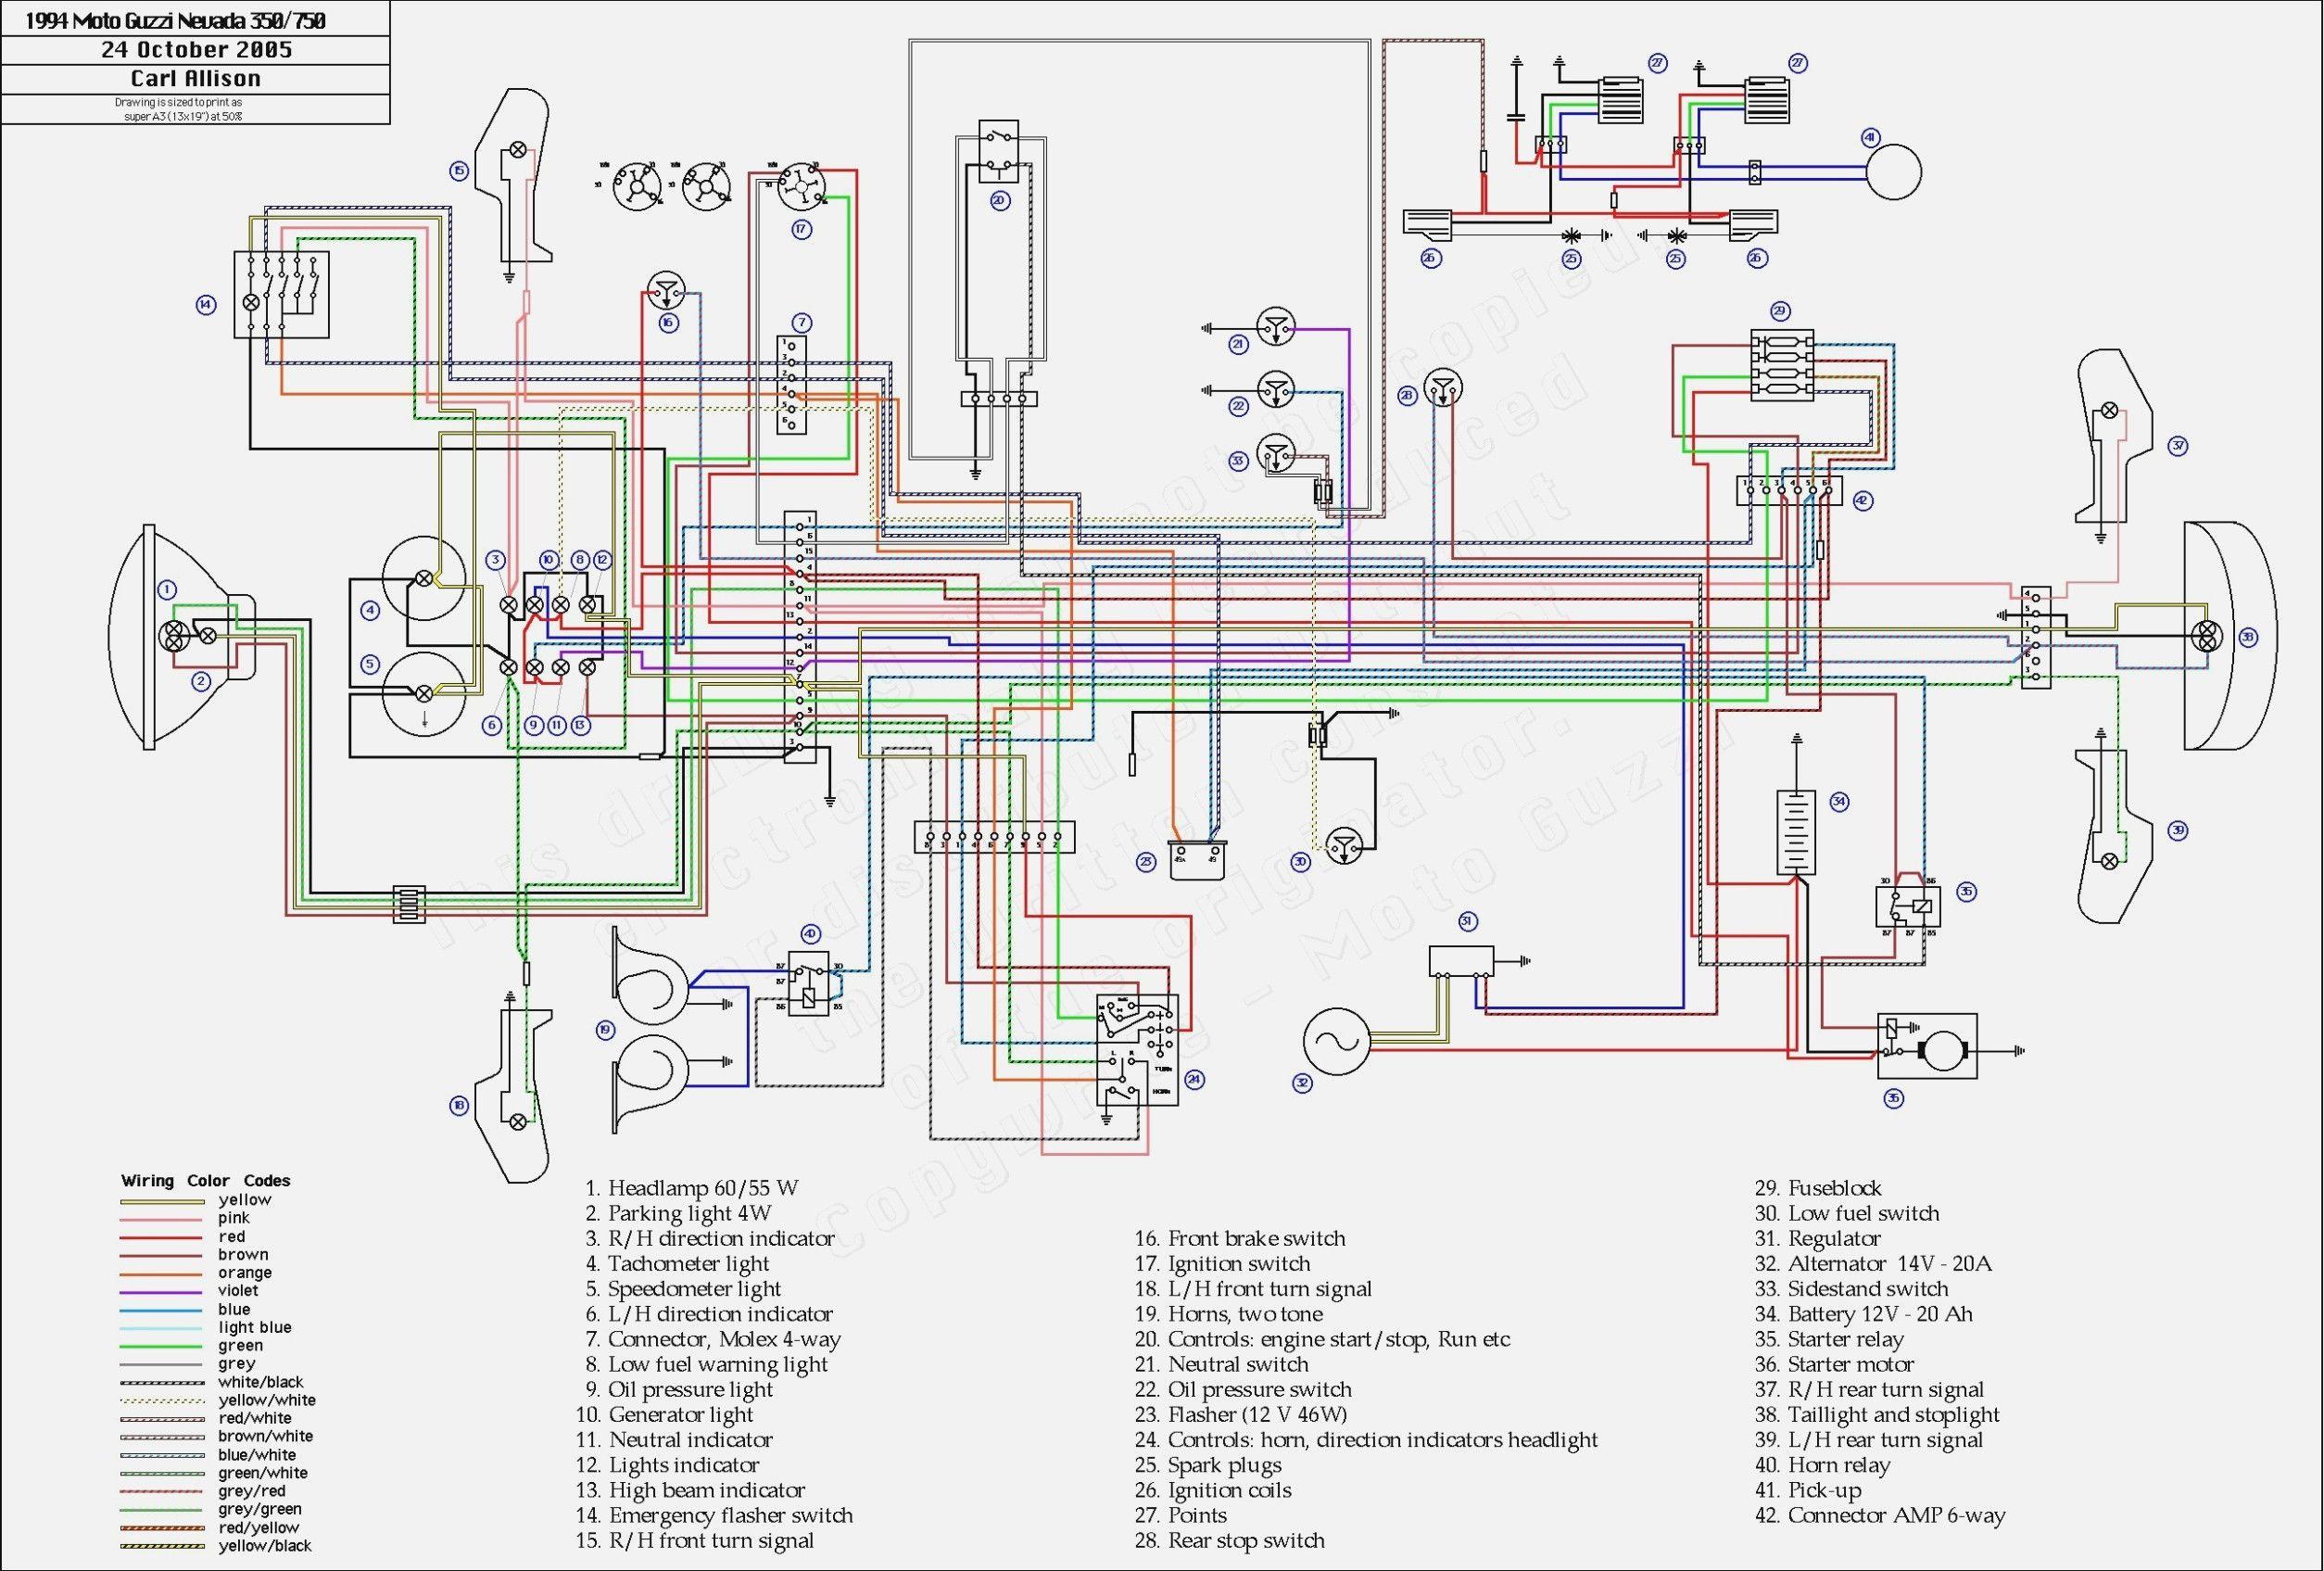 Turn Signal Switch Wiring Diagram In 2021 Trailer Wiring Diagram Electrical Diagram Electrical Wiring Diagram